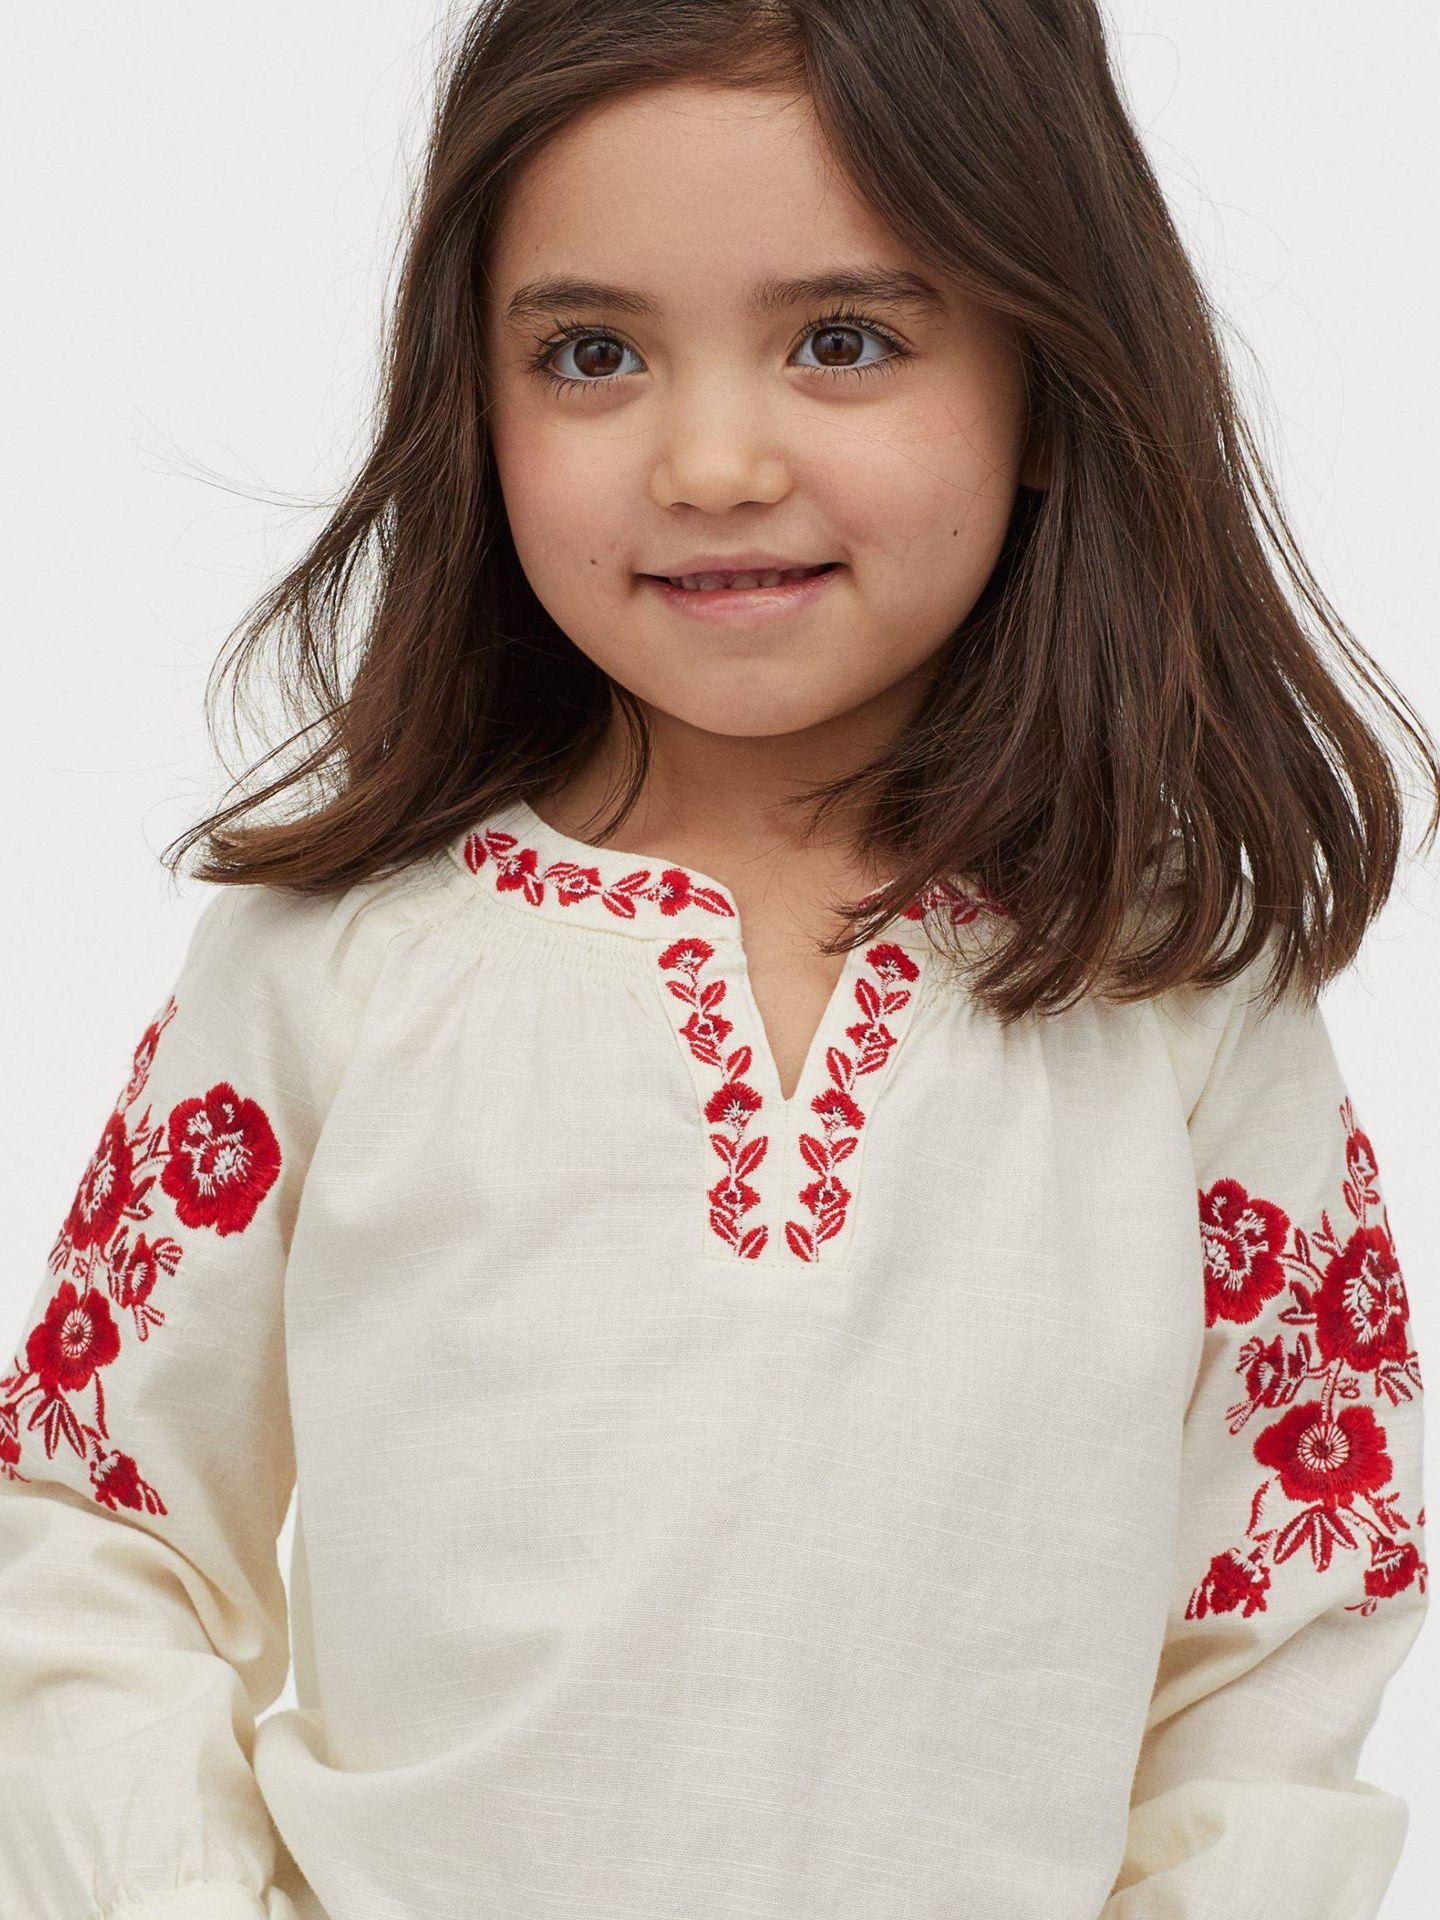 Blusa de HyM para madres e hijas. (Cortesía)